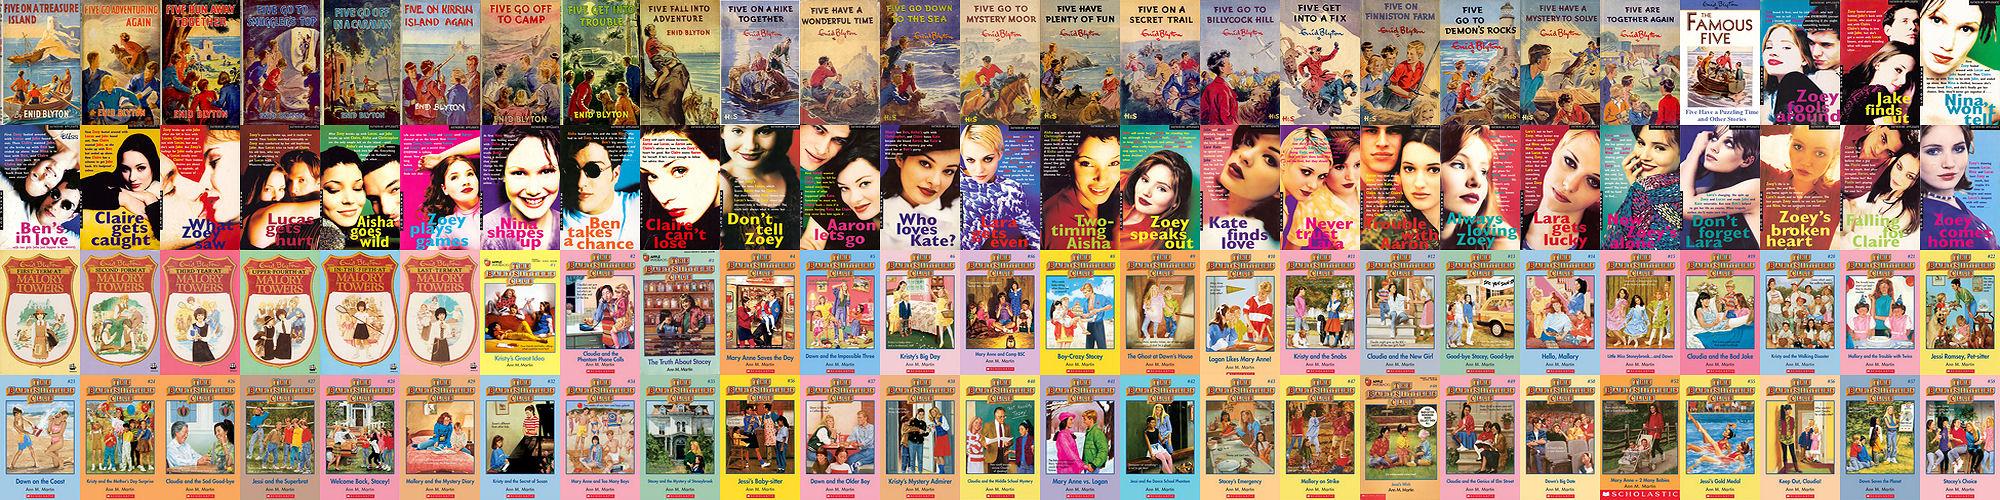 Nostalgic Bookshelf